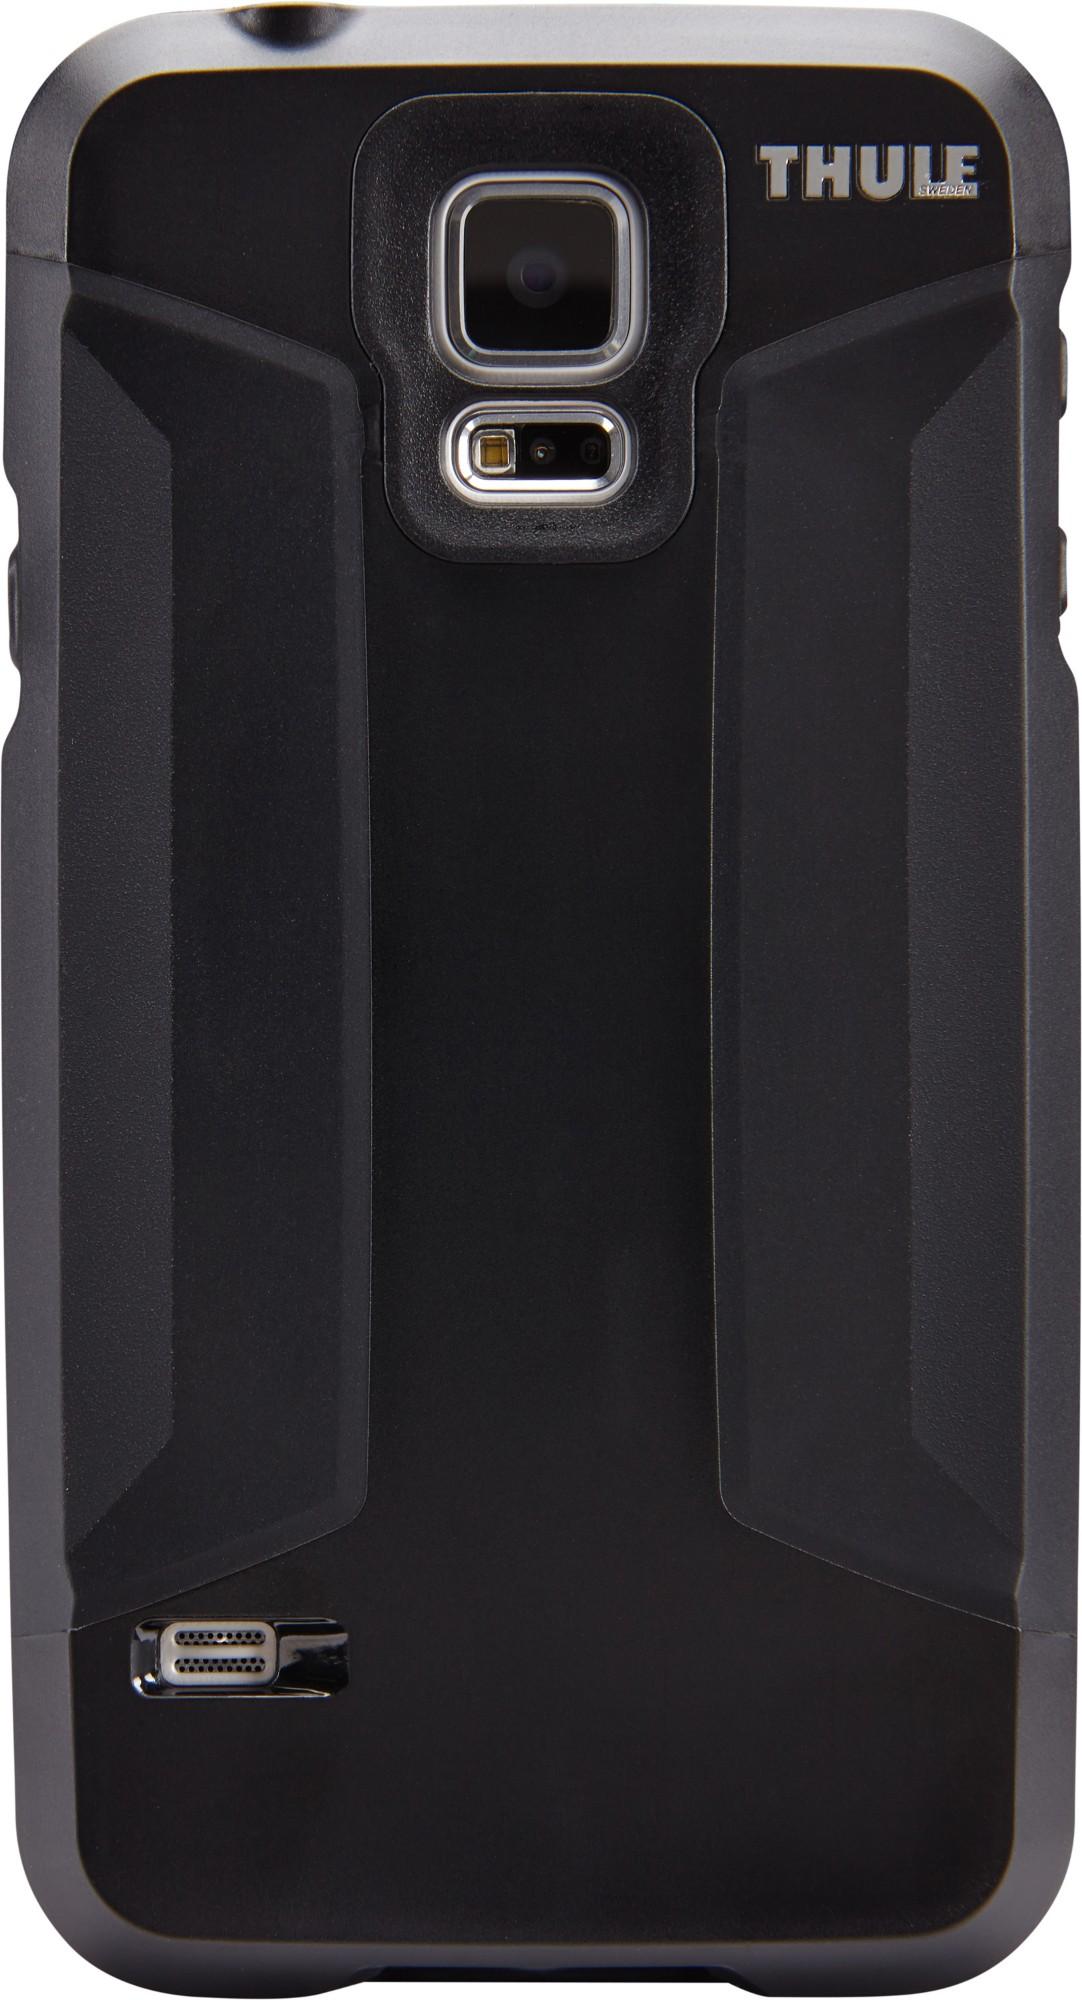 Atmos X3 Phone Case Galaxy S5 Black